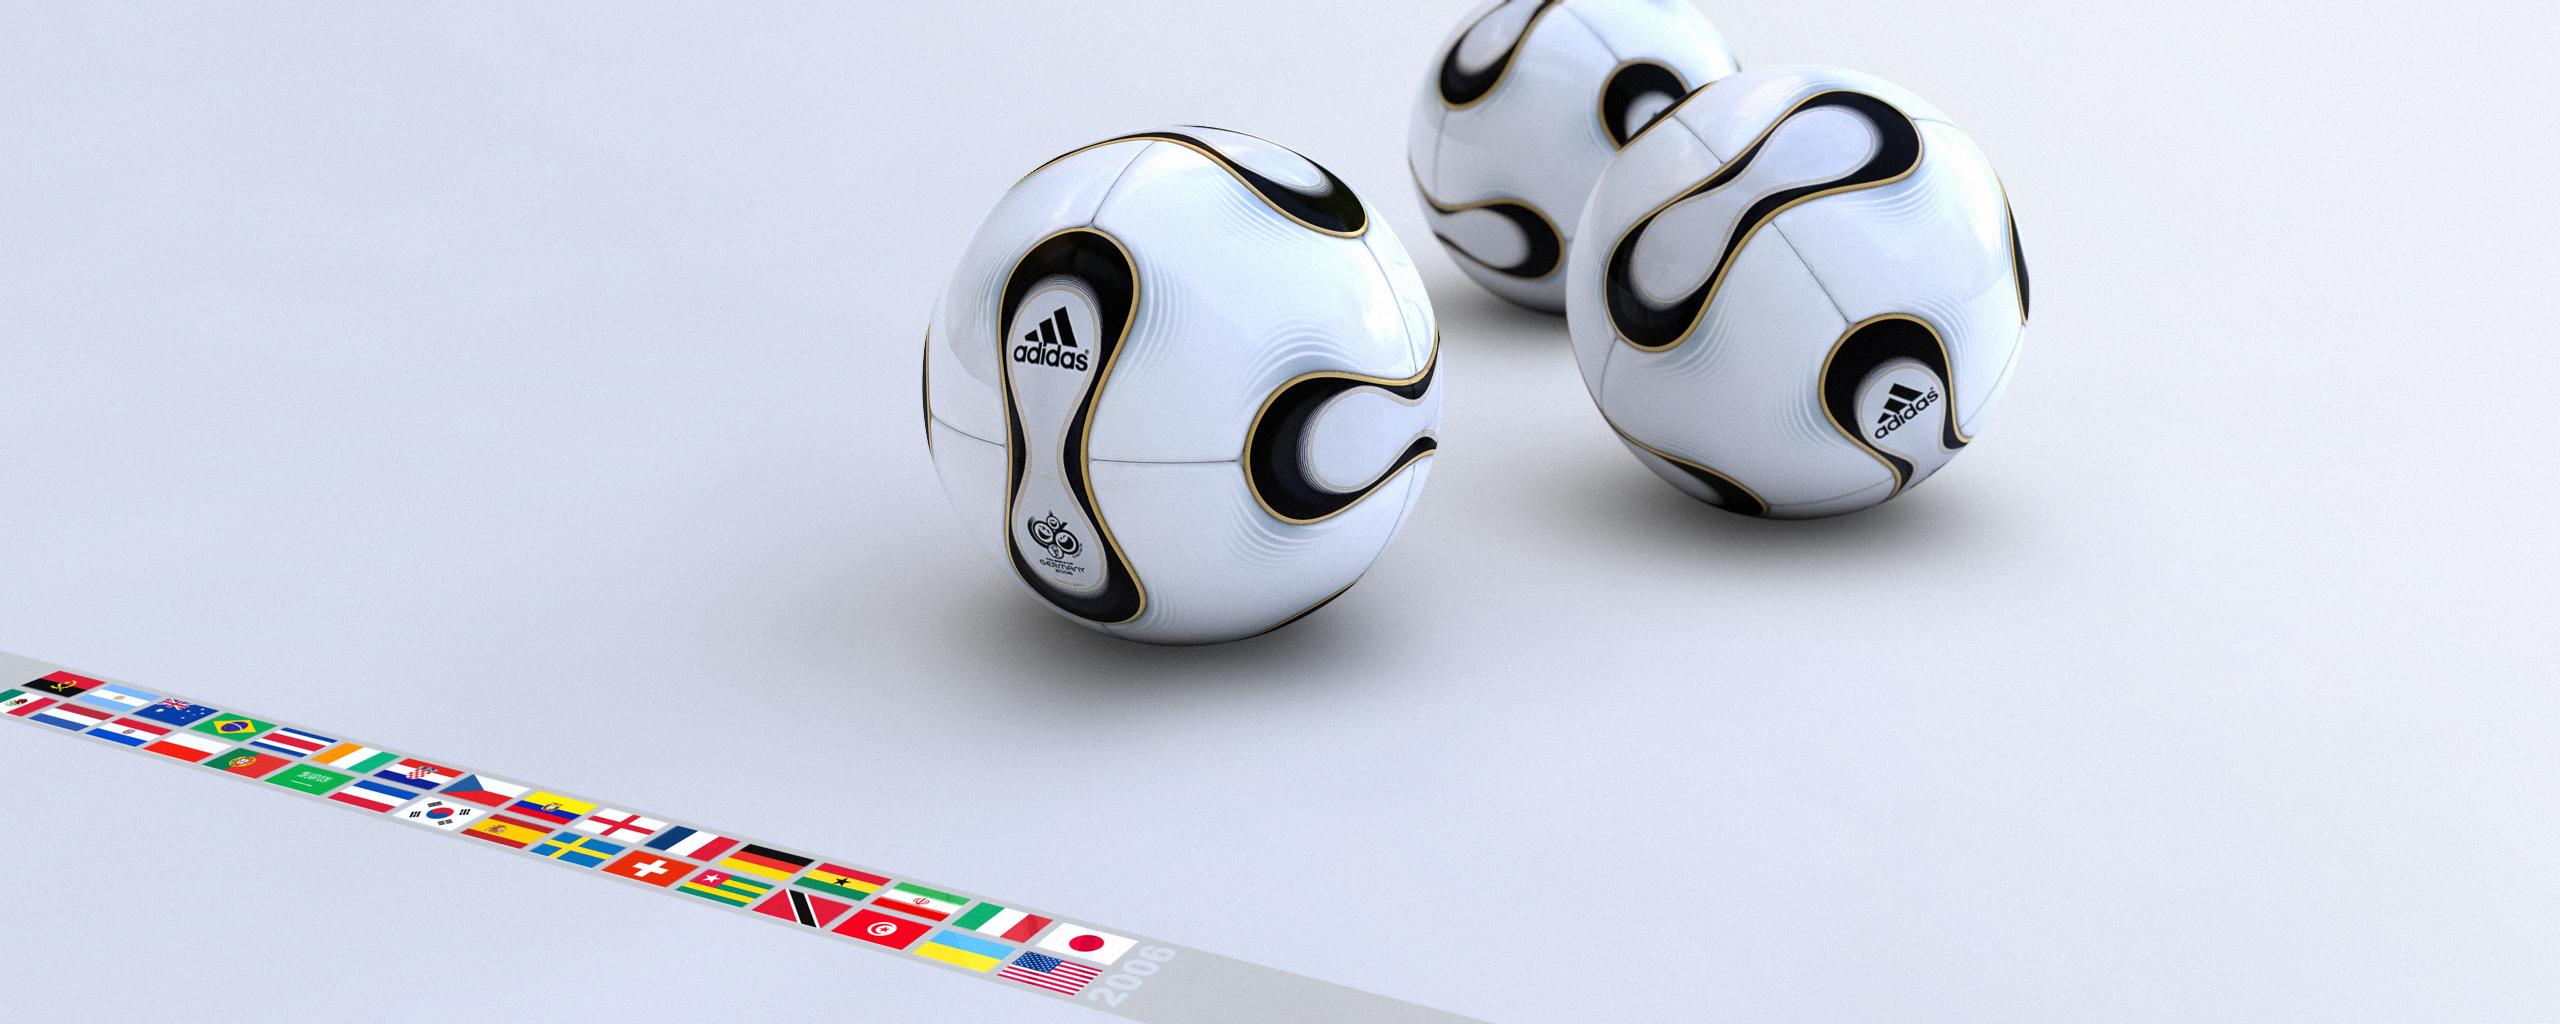 Атака мячиков  № 1547790 бесплатно